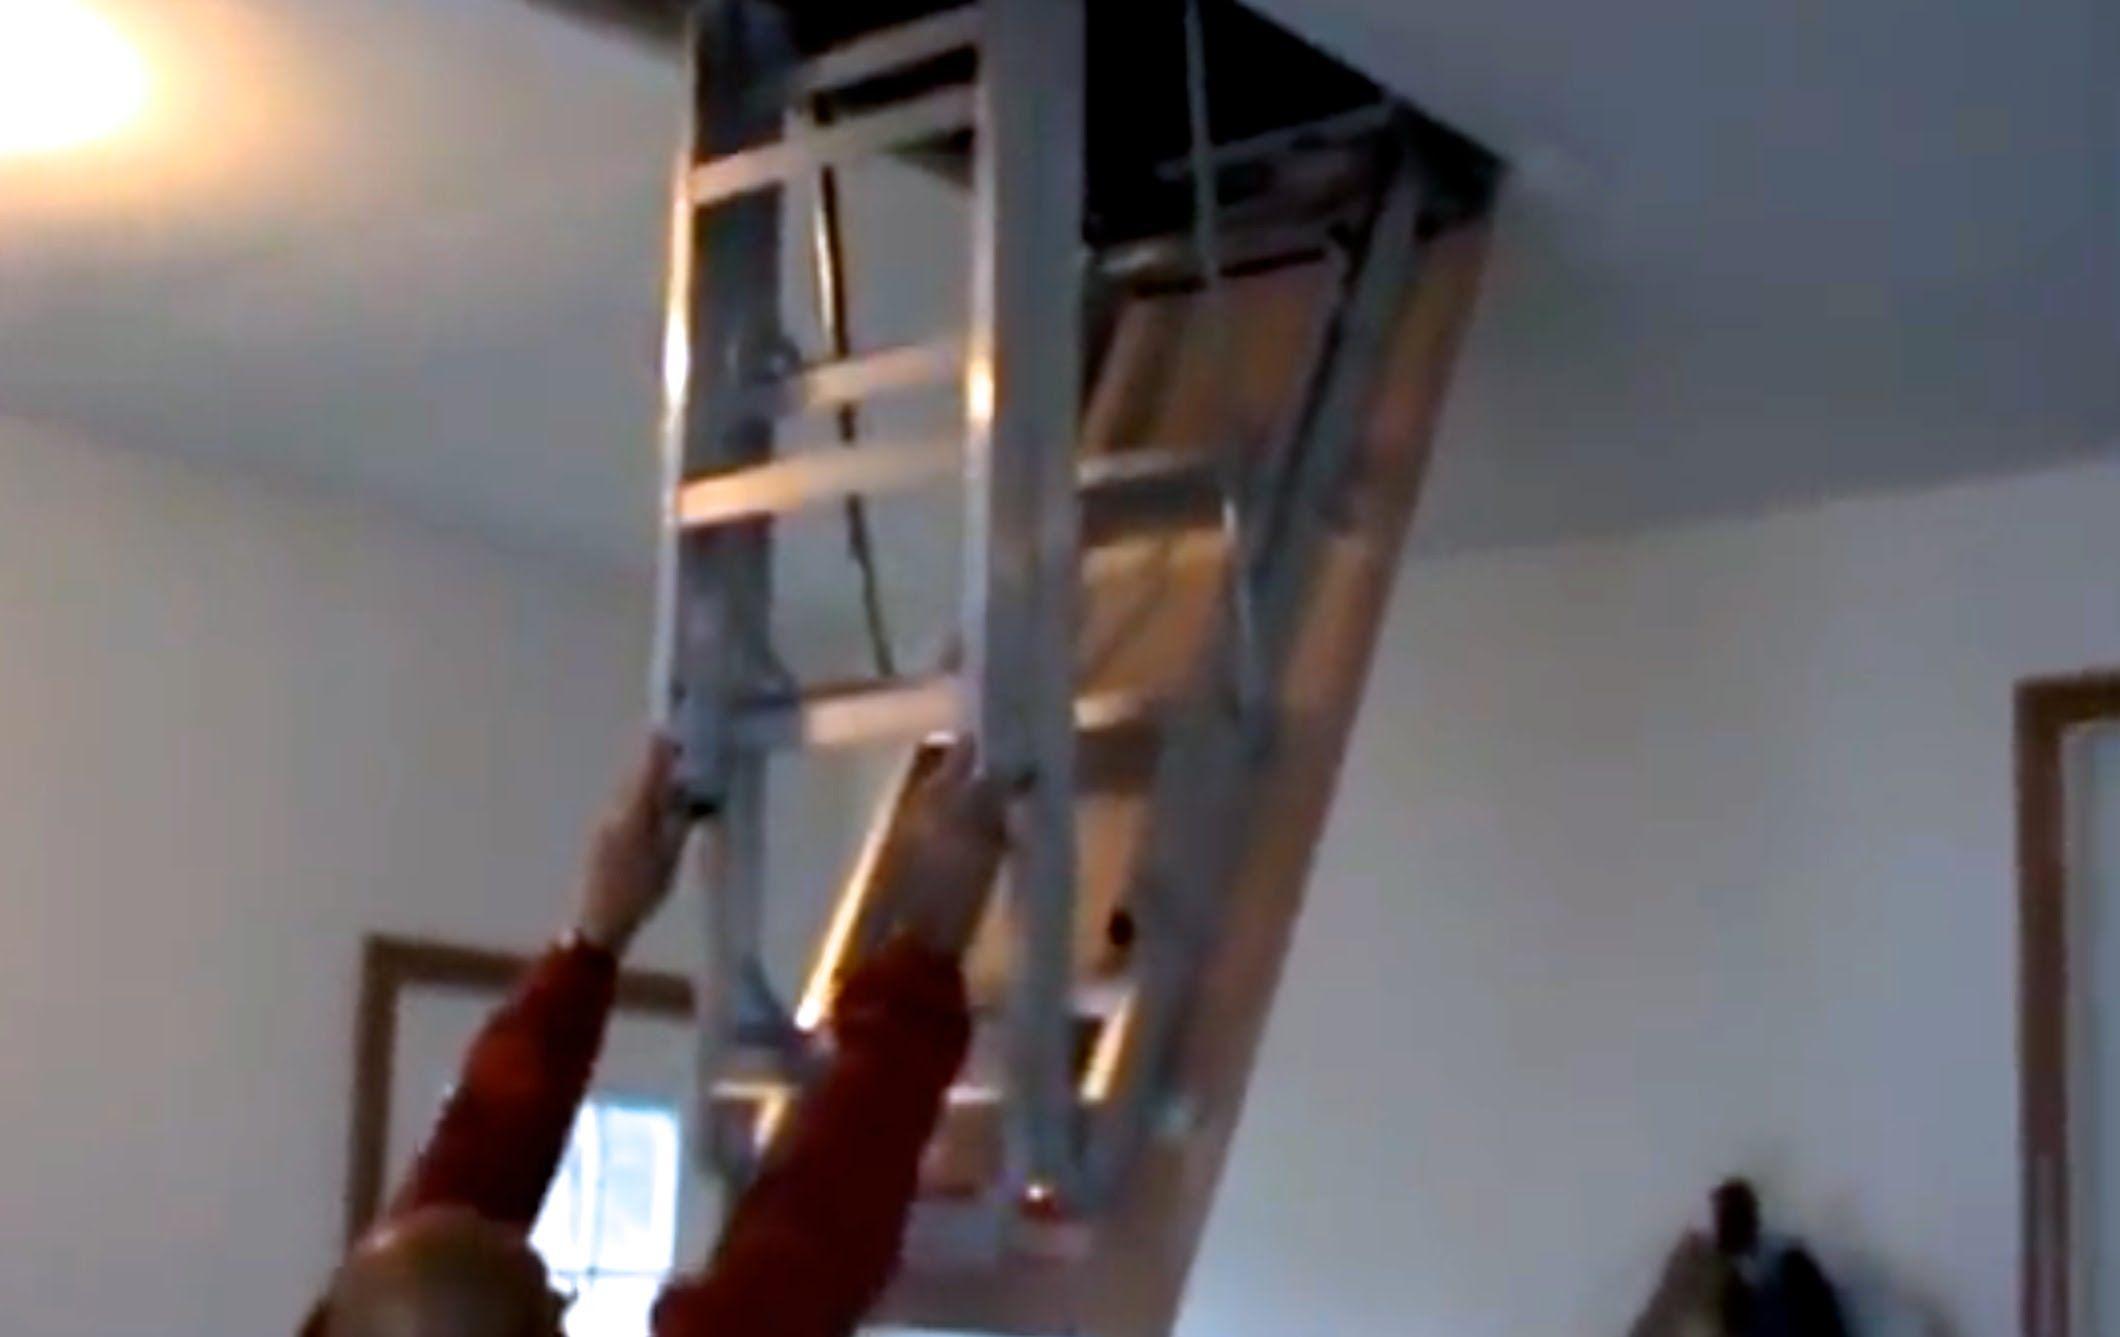 How To Install Attic Pull Down Stairs Gladiator Garage Organization 60059323 Garage Workshop Ideas How To Chang Attic Renovation Attic Stairs Attic Flooring